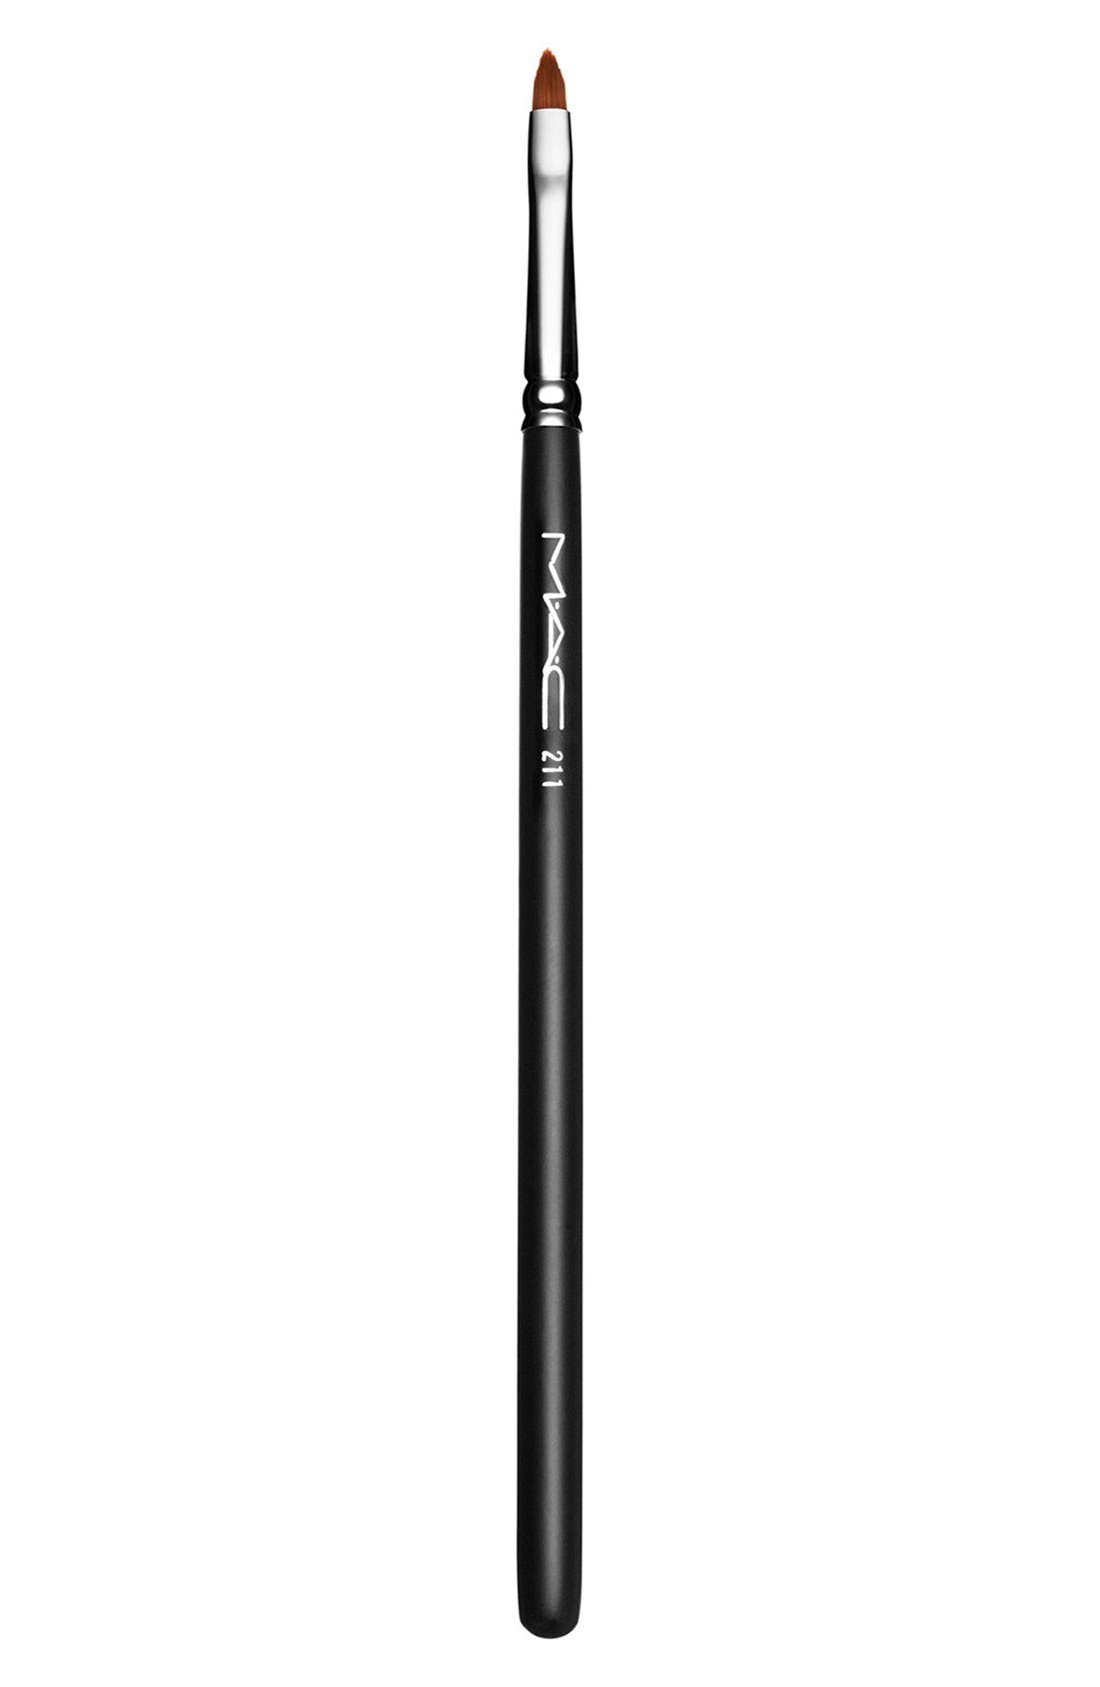 MAC COSMETICS, MAC 211 Pointed Liner Brush, Main thumbnail 1, color, 000